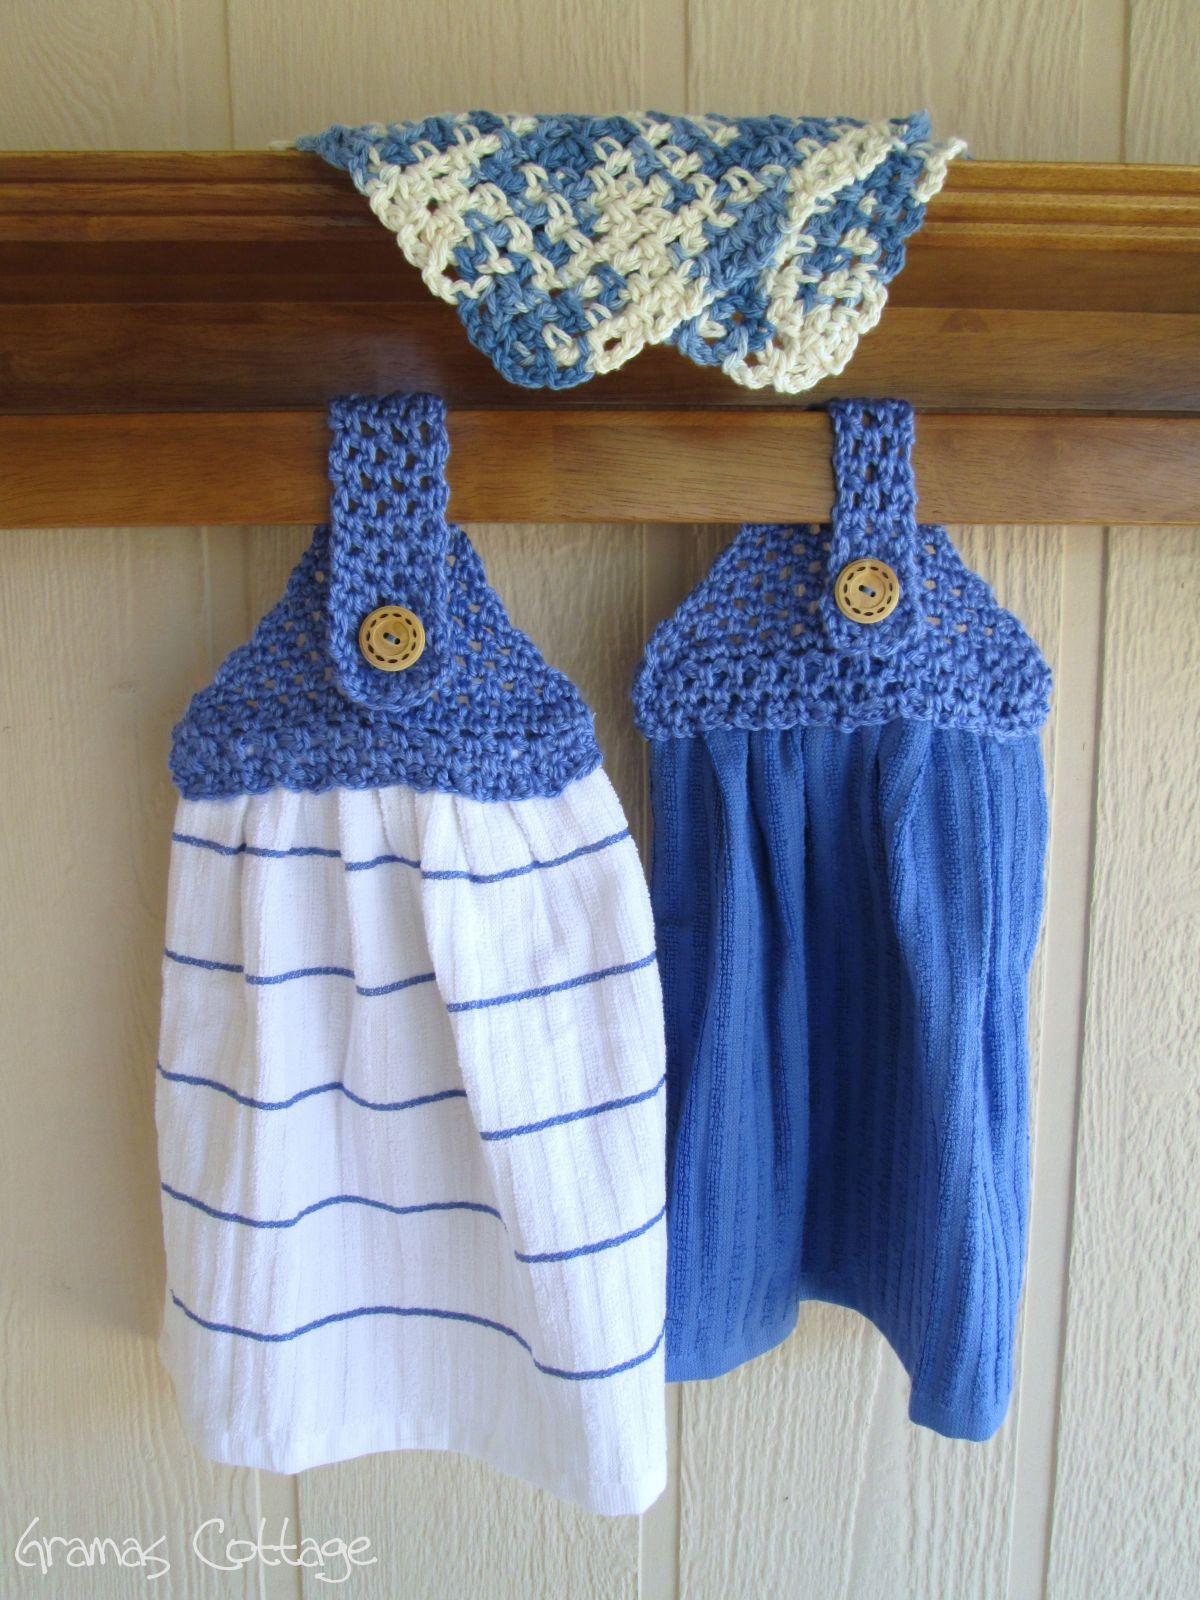 Hand Crochet Kitchen Towels Crochet Pinterest